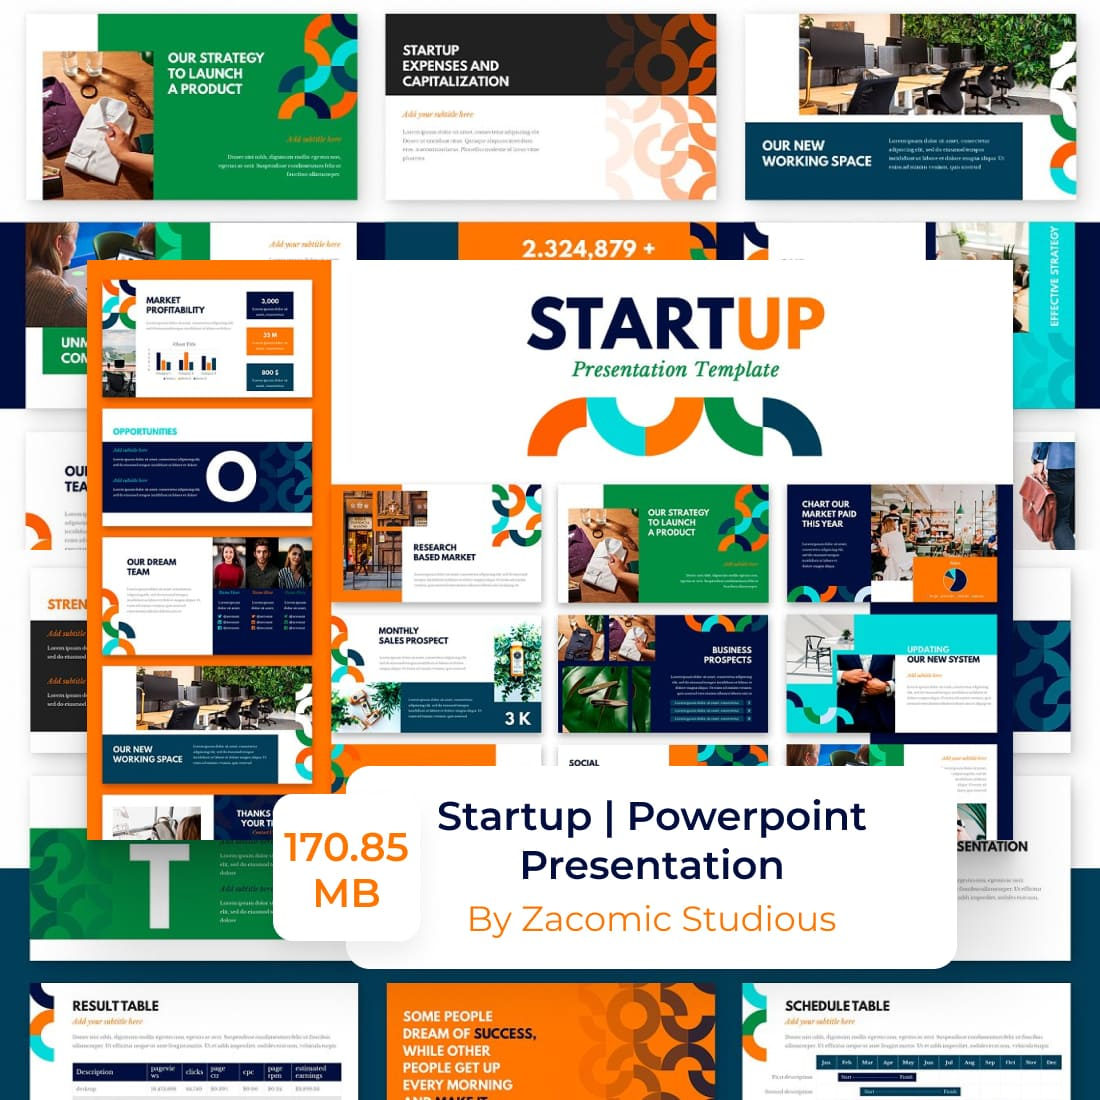 Startup Powerpoint Presentation Template by MasterBundles.